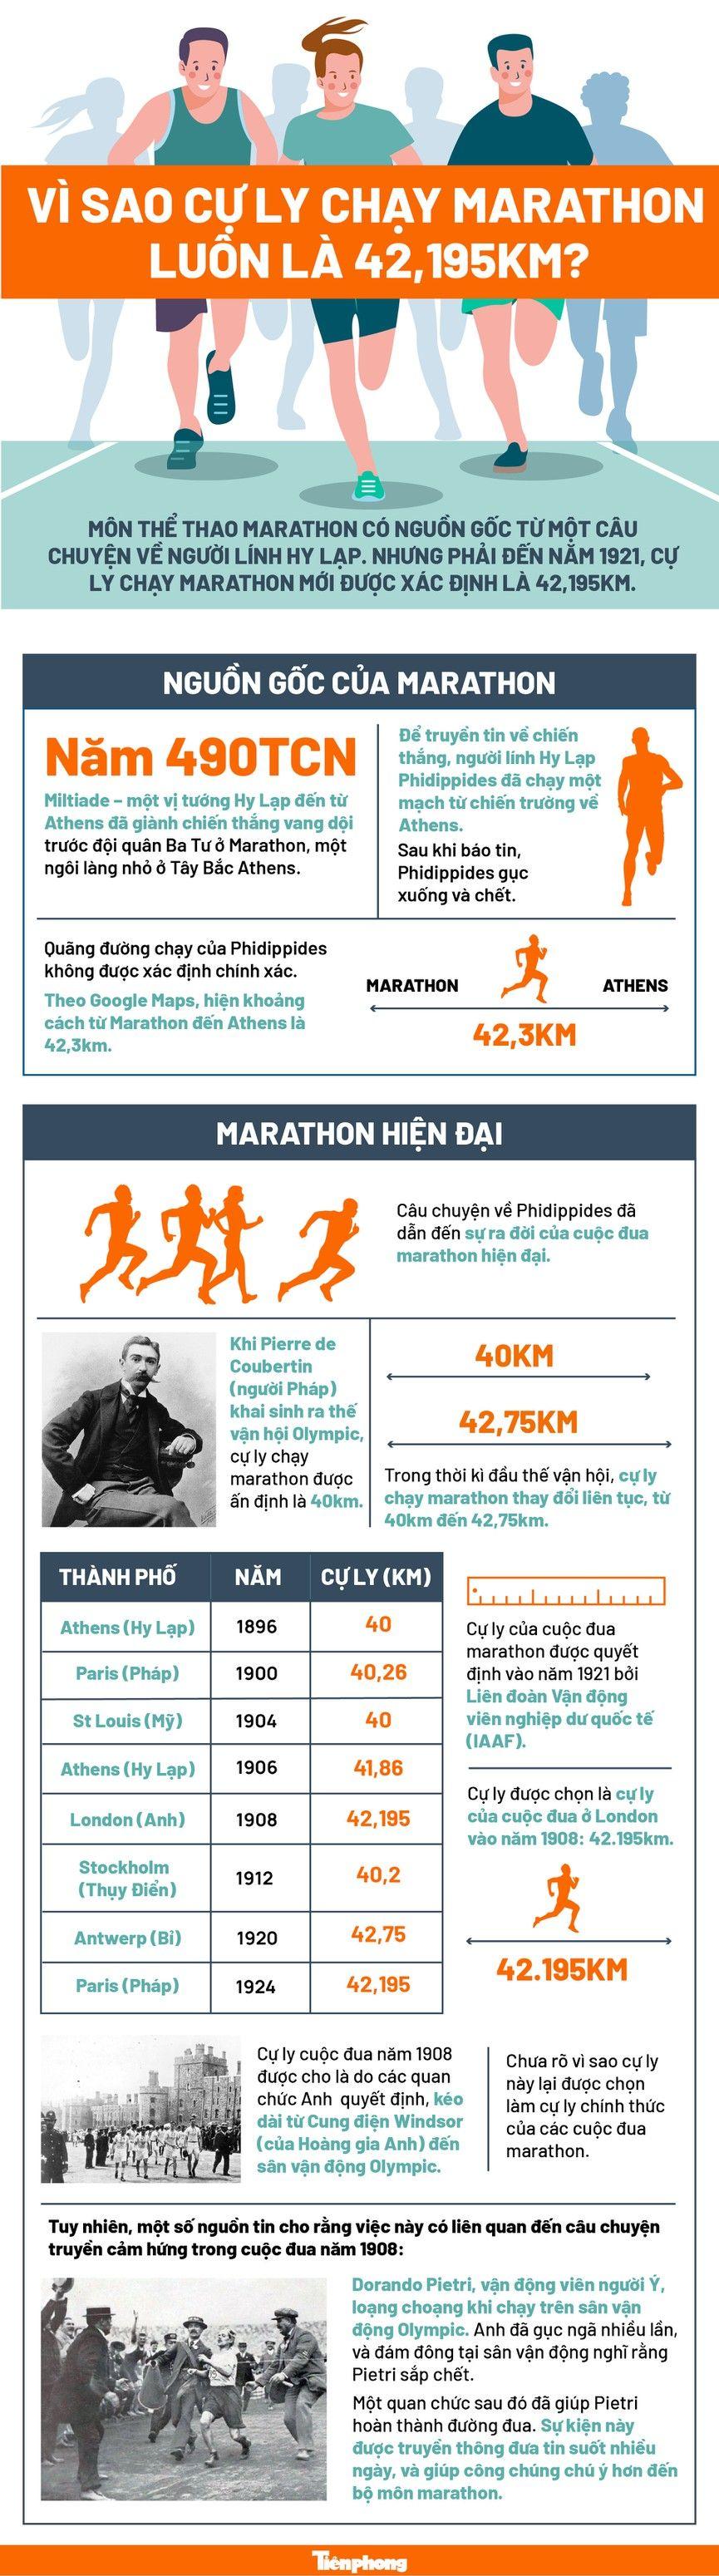 cự ly chạy Full Marathon